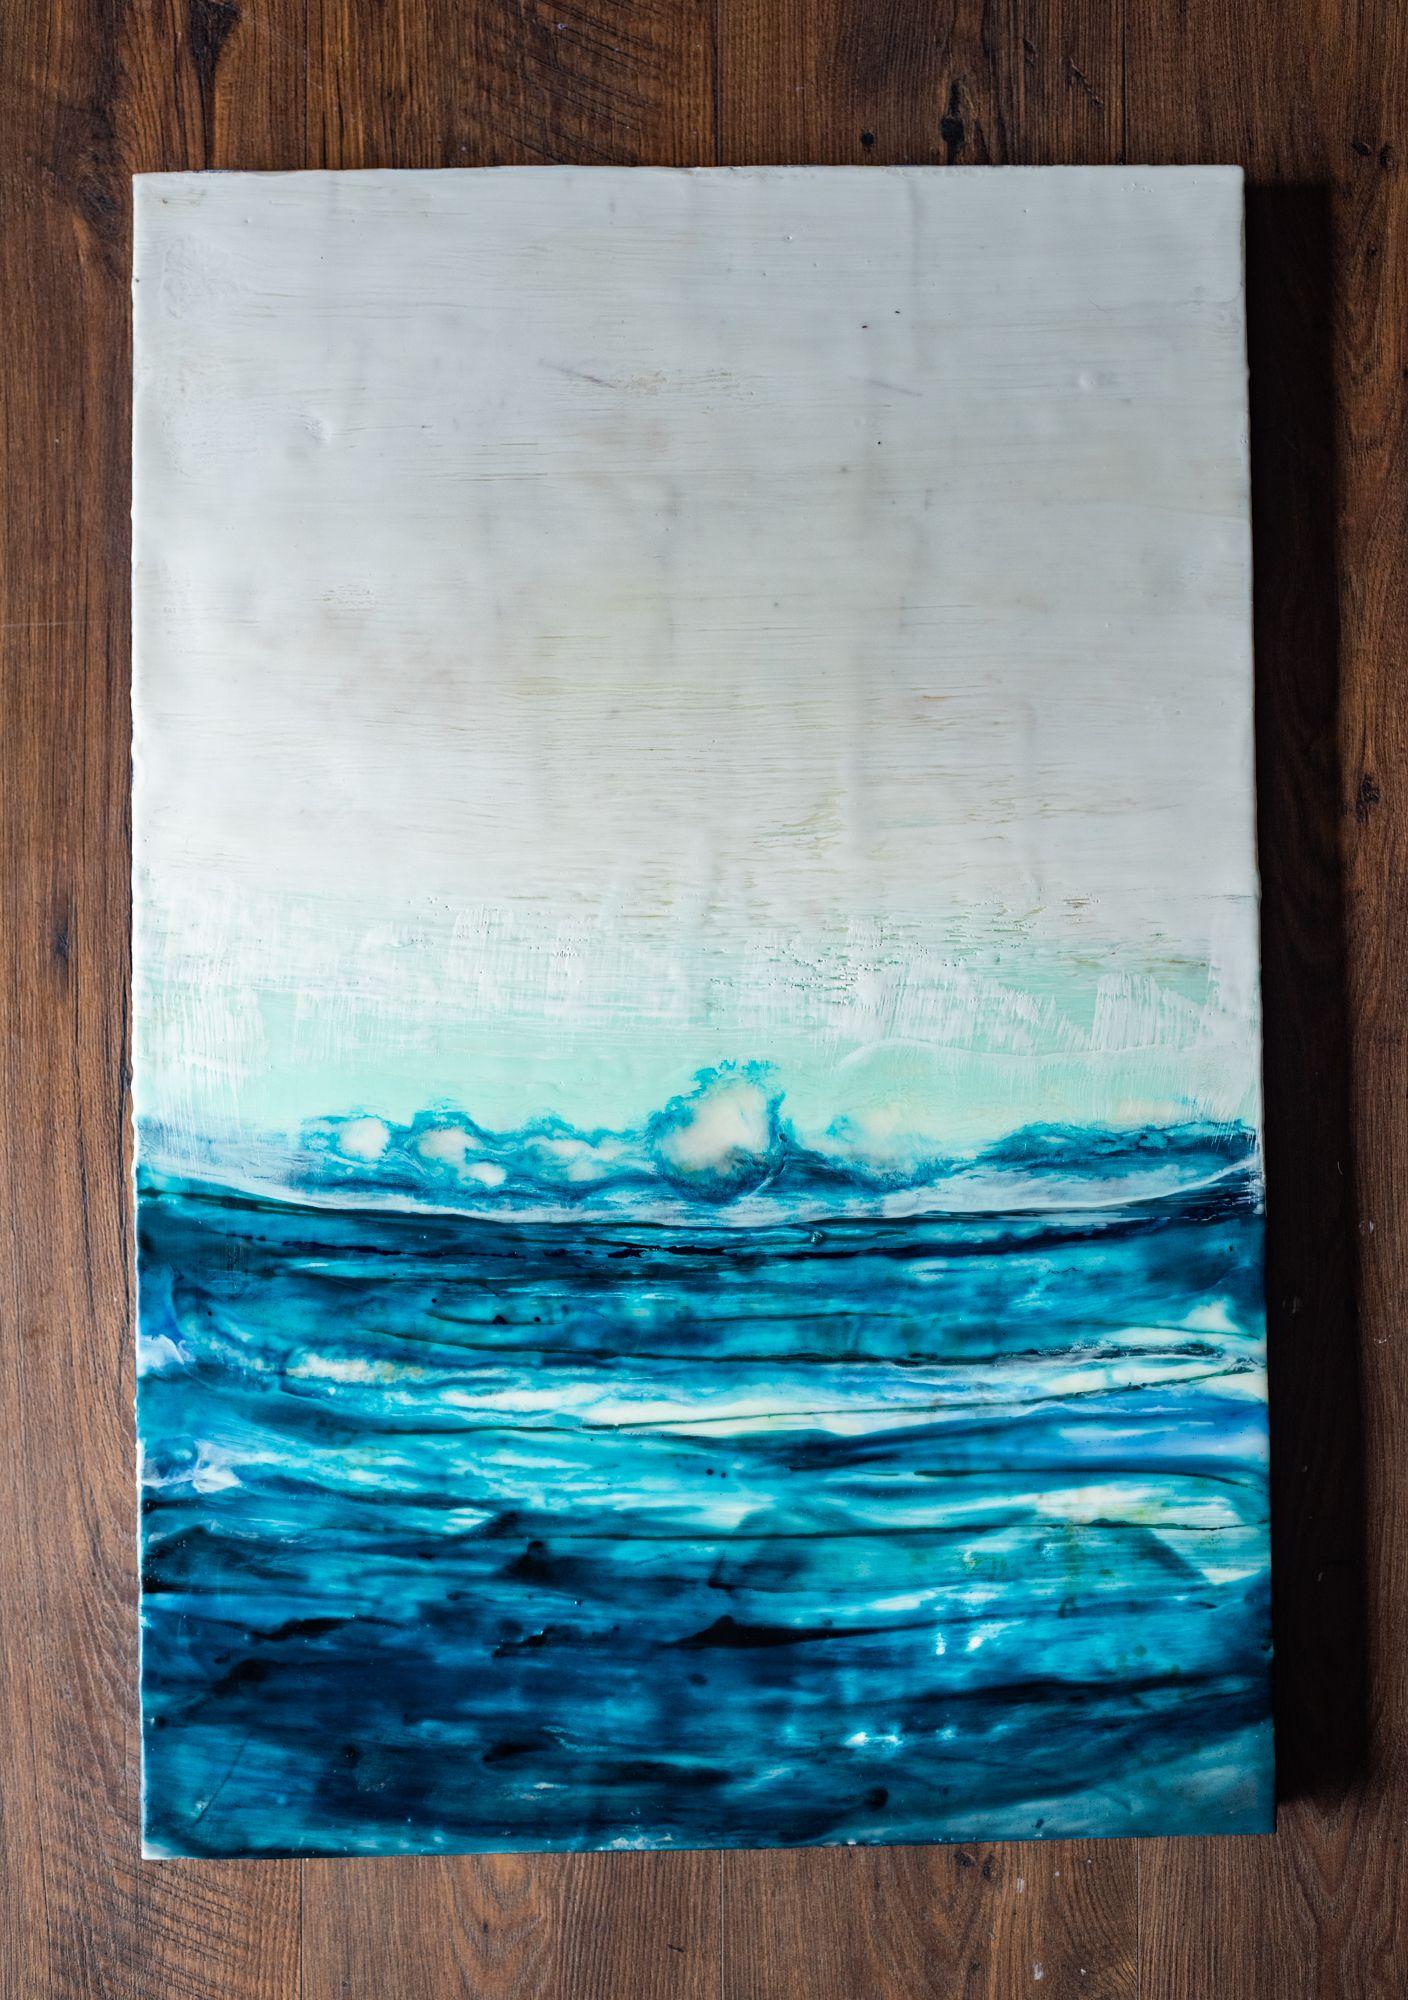 Wood Panel Wood Panel Oil Painting Beeswax Encaustic Painting- Original Art